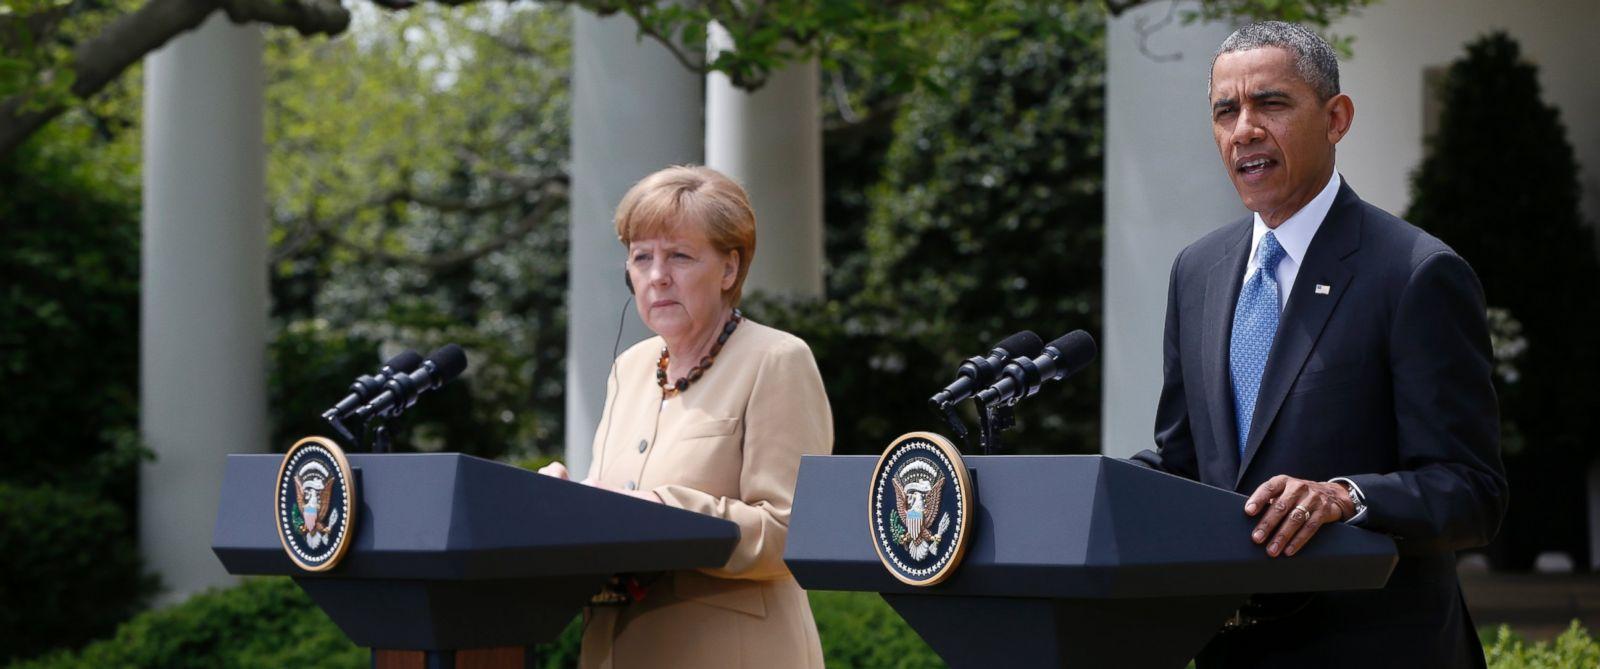 PHOTO: President Barack Obama and German Chancellor Angela Merkel